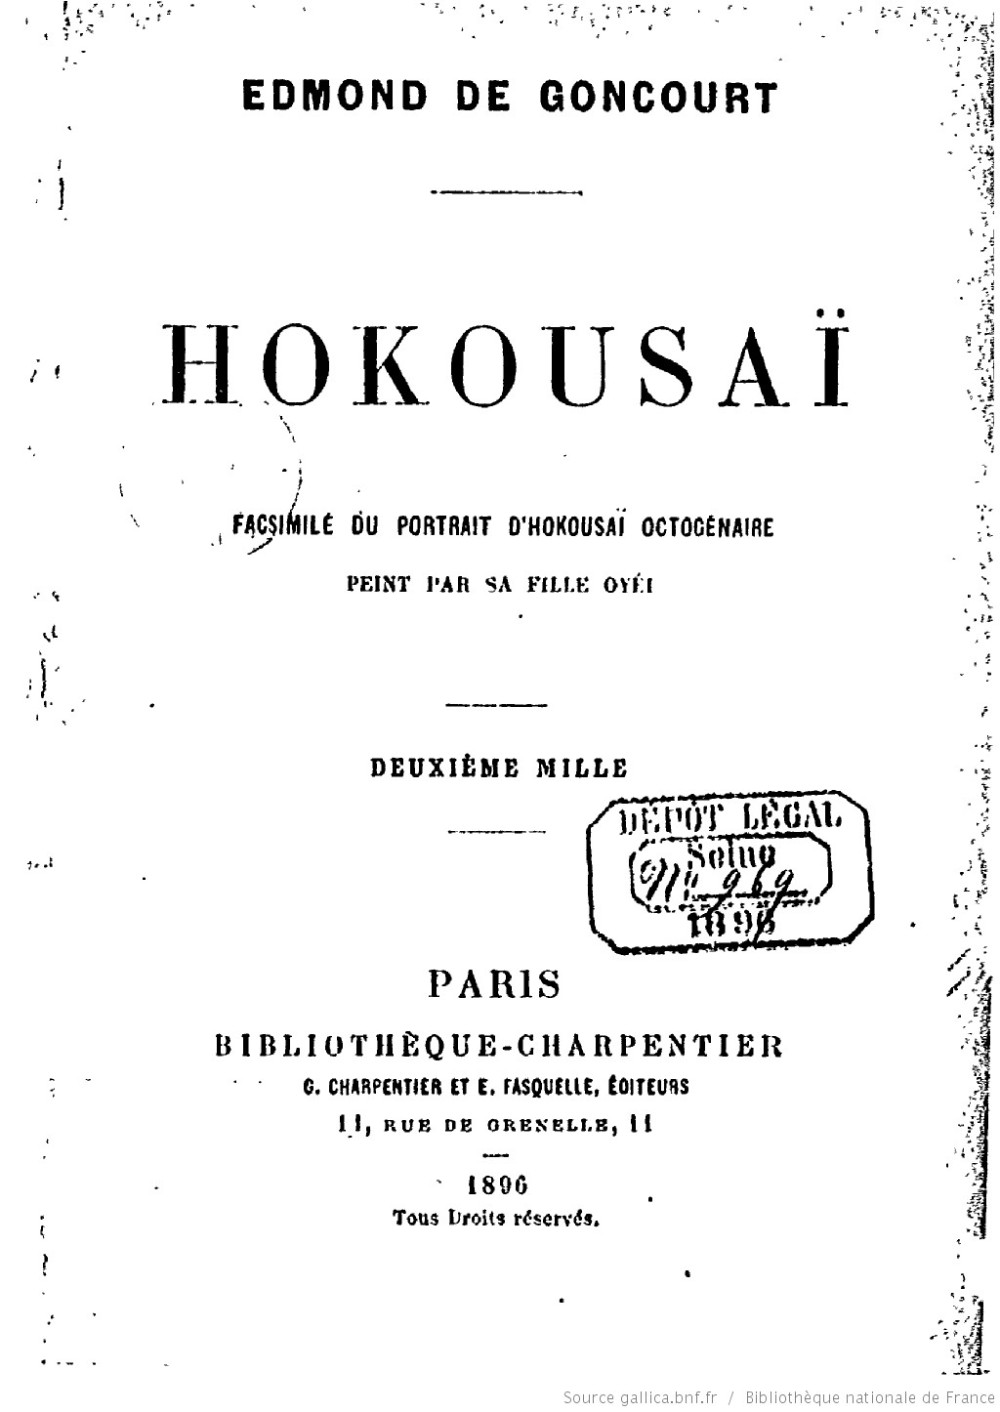 Hokousaï_-_l'art_japonais_au_[...]Goncourt_Edmond_bpt6k5815928x